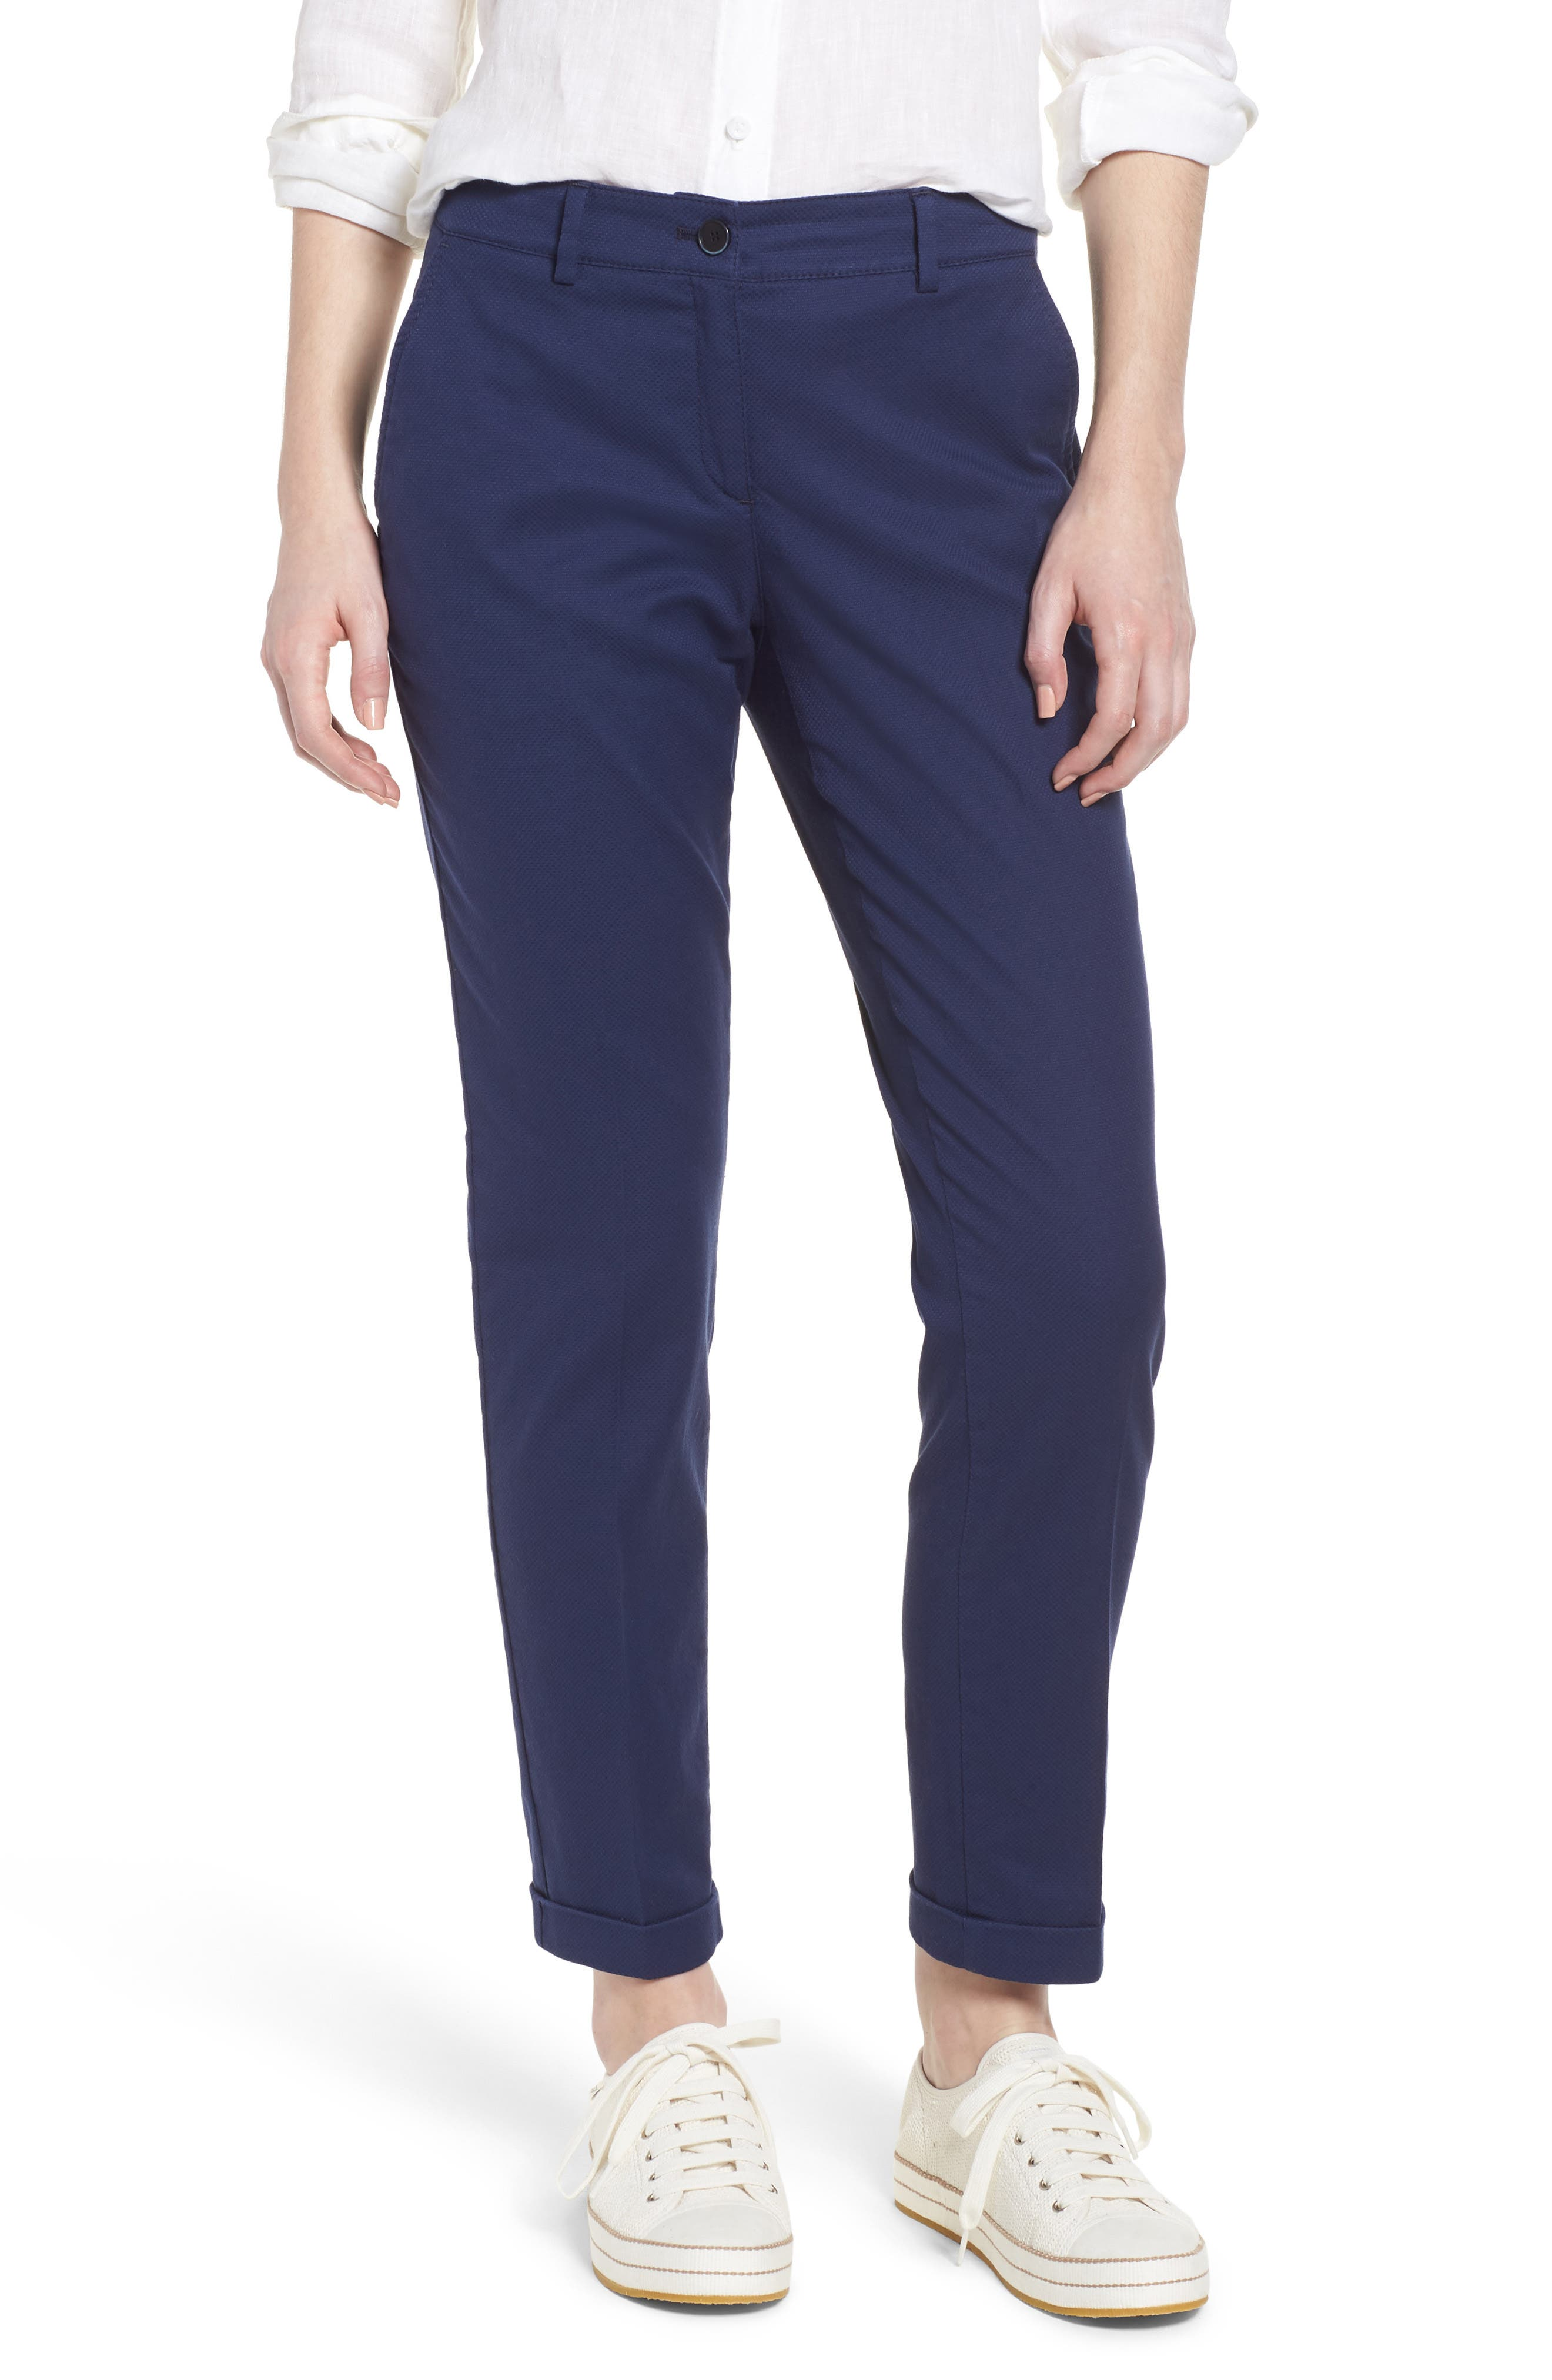 Maron Cuffed Straight Leg Pants,                         Main,                         color,